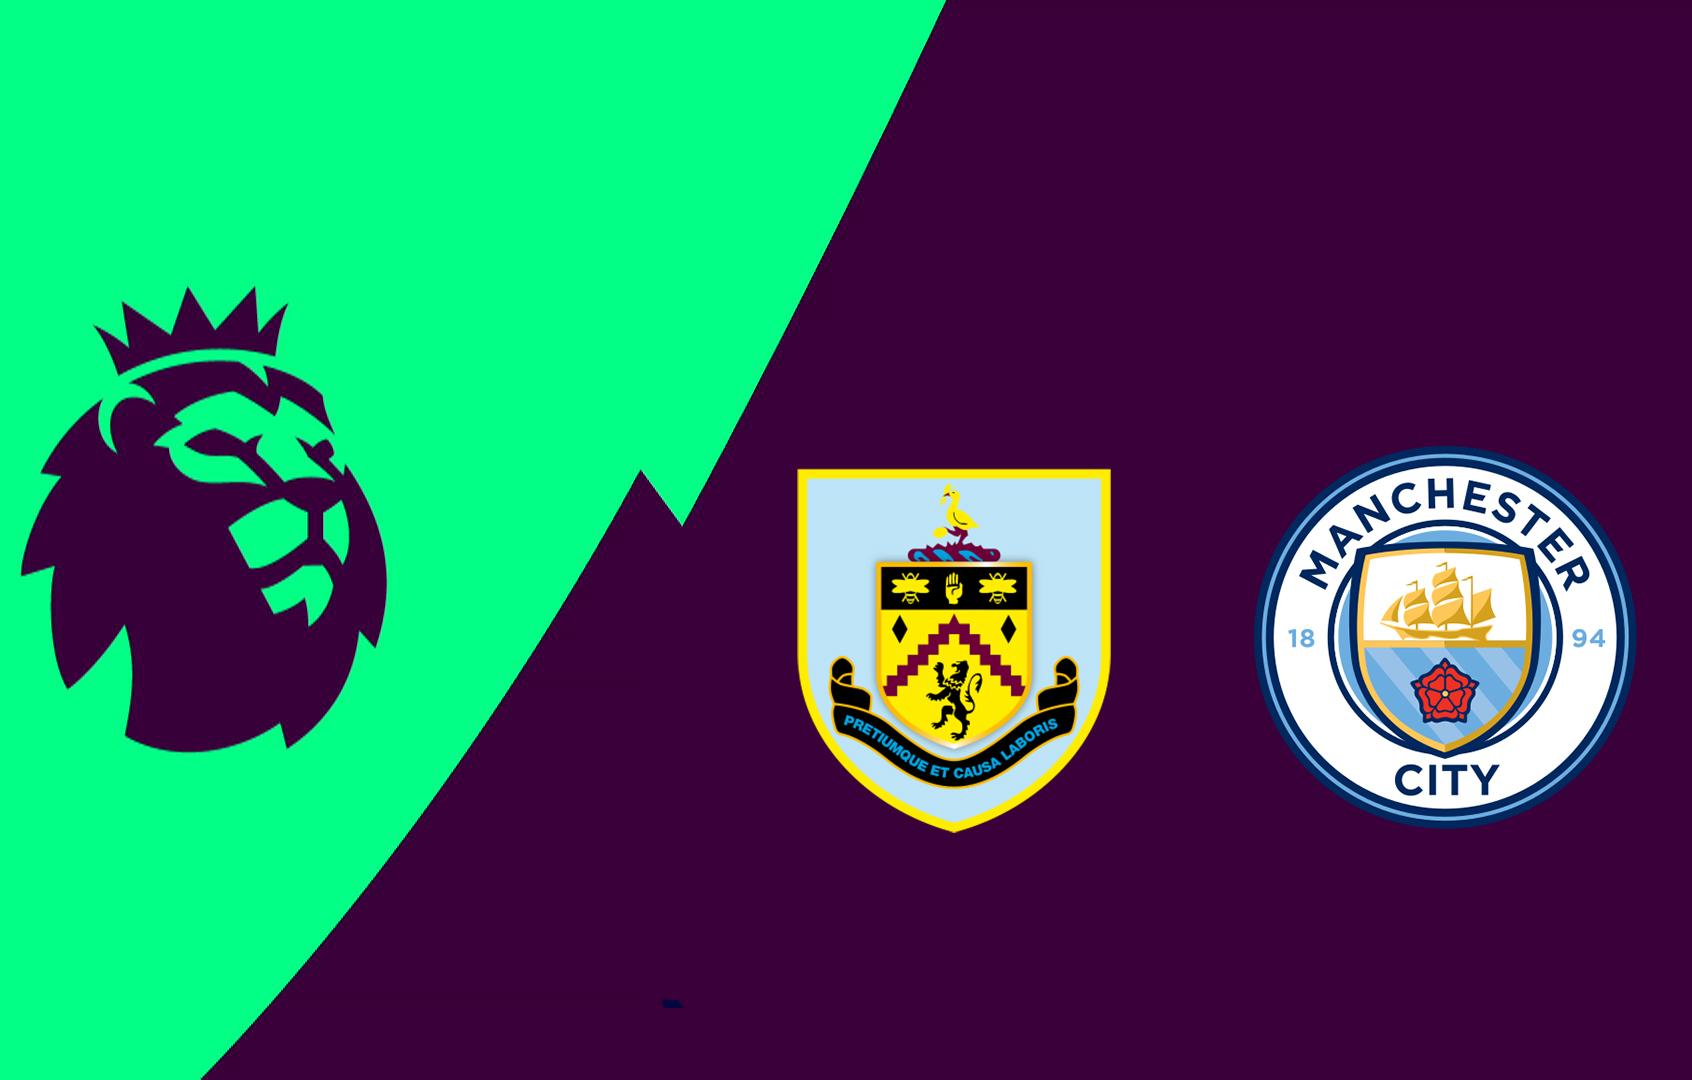 soi-keo-ca-cuoc-bong-da-ngay-4-12-burnley-vs-manchester-city-chay-da-toi-derby-b9 1